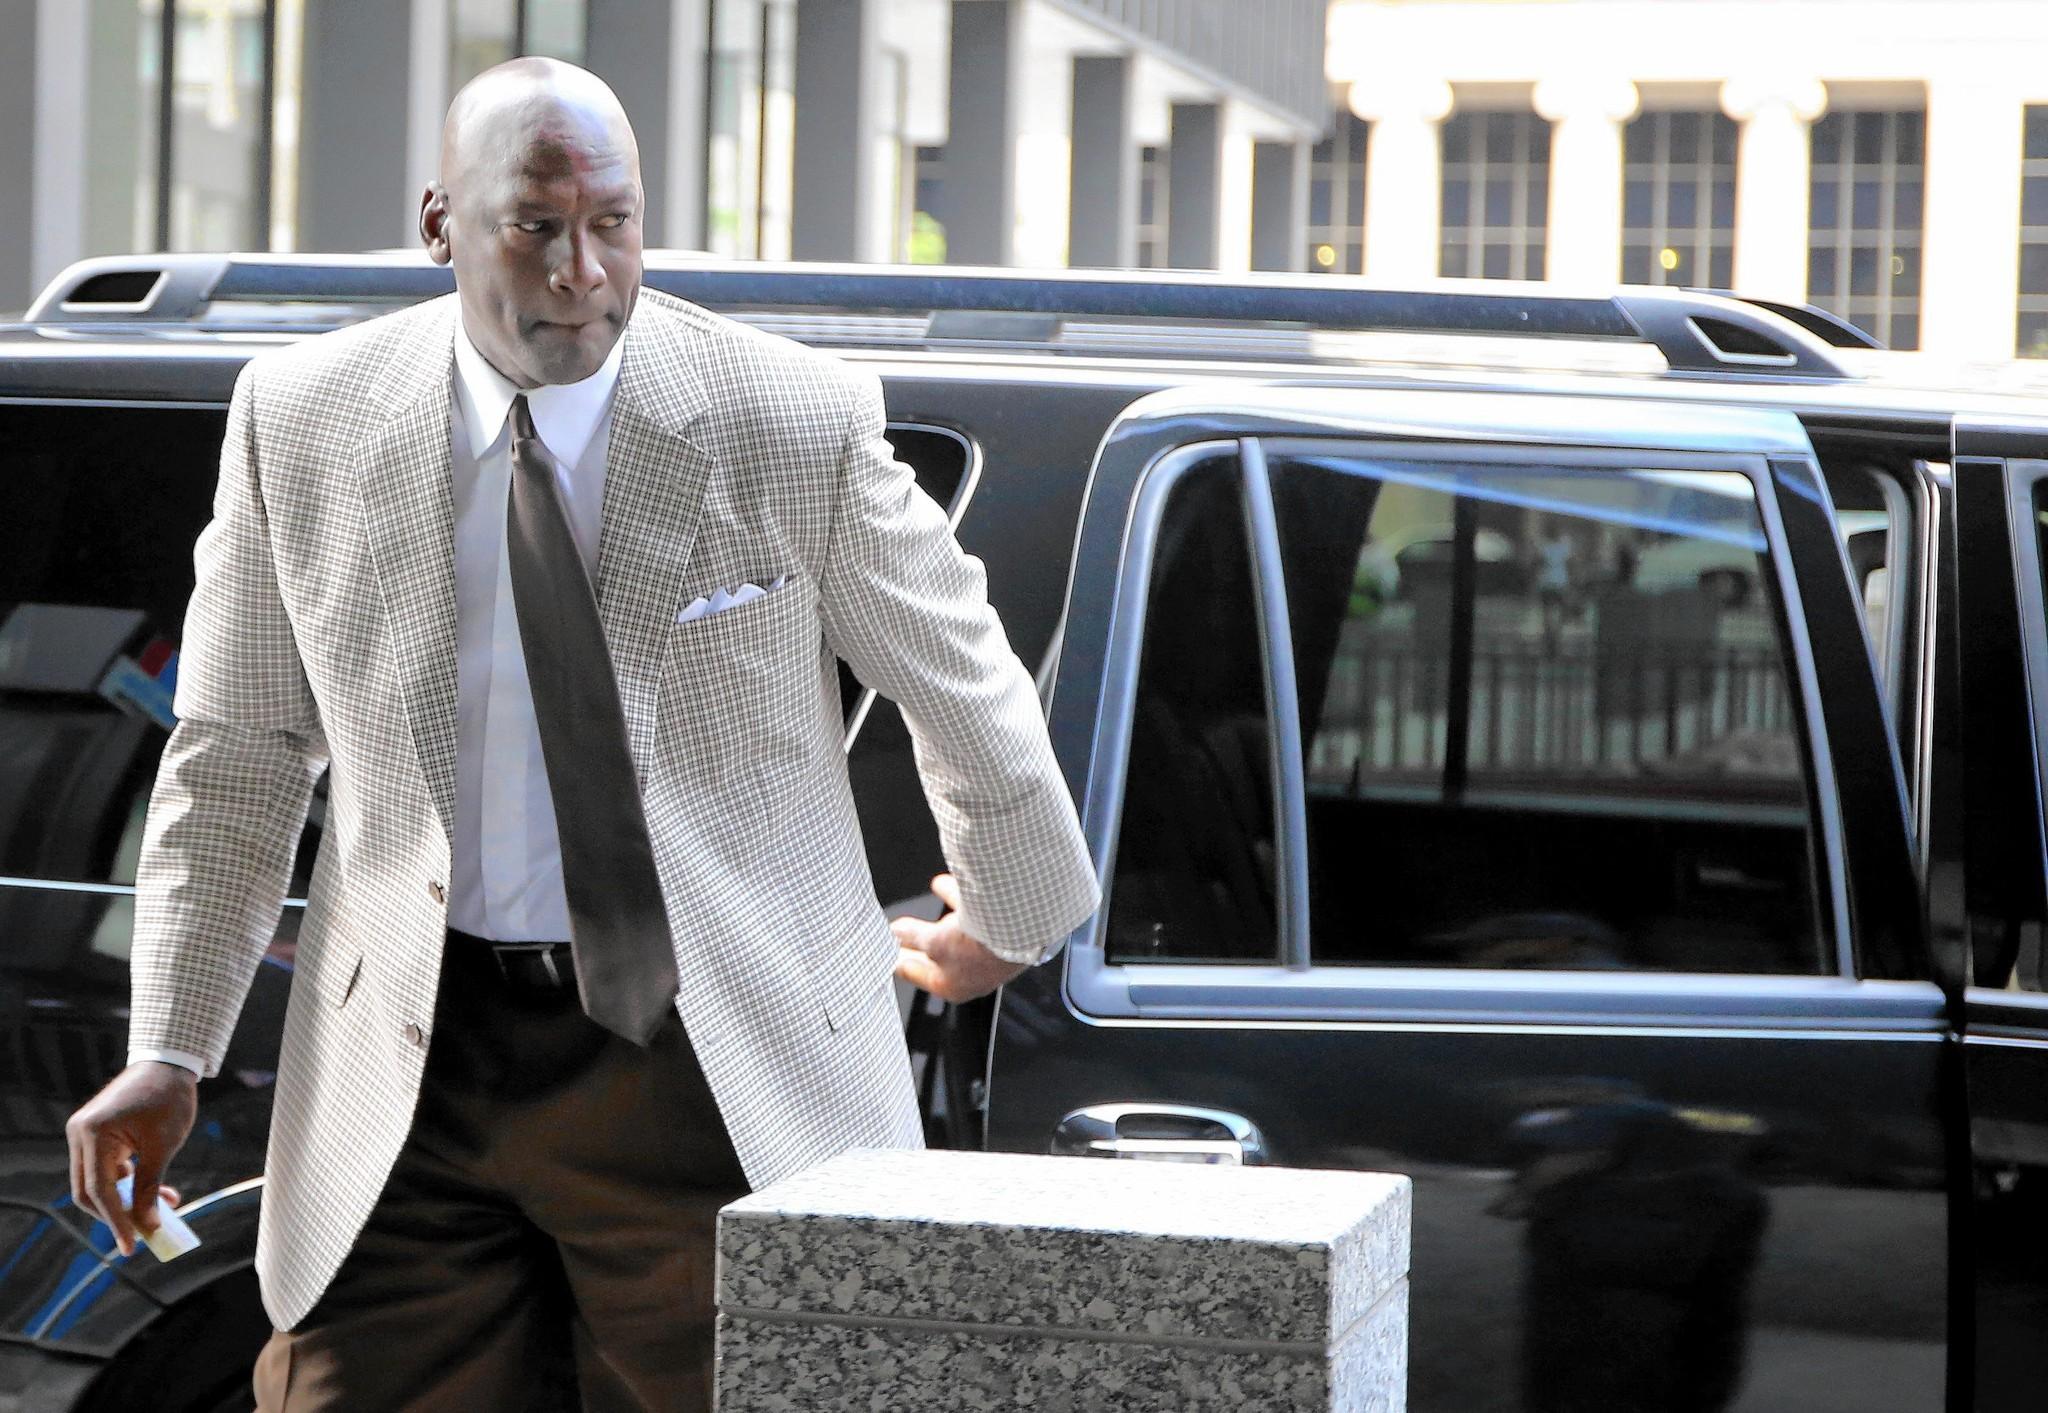 Michael Jordan's mega-deals revealed as federal trial begins